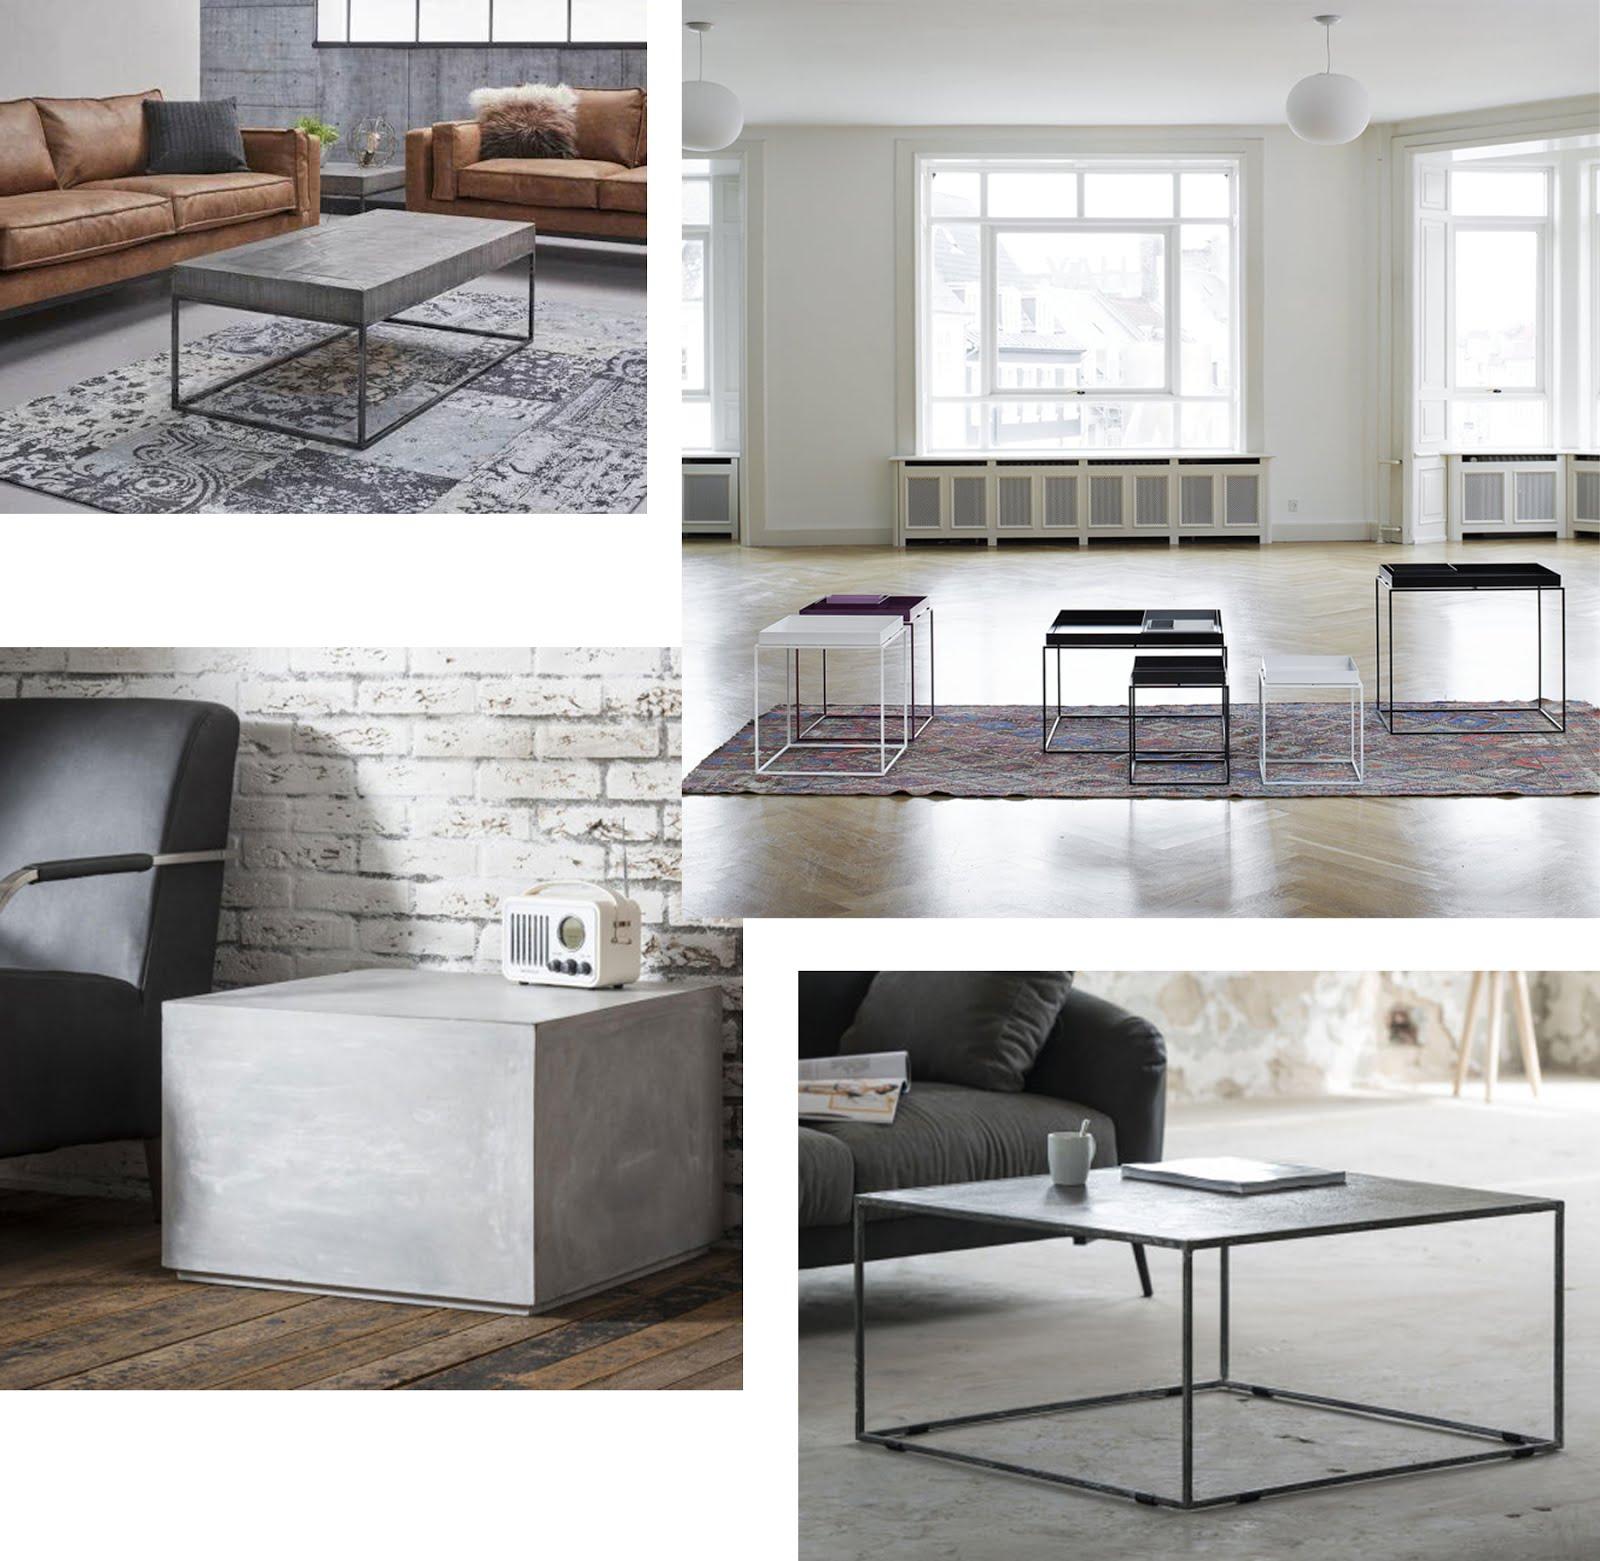 Lions home, interior webshop, interieur, salon tafel, minimalistisch, licht, coffee table, minimal, design, hay tray, concrete, betonlook